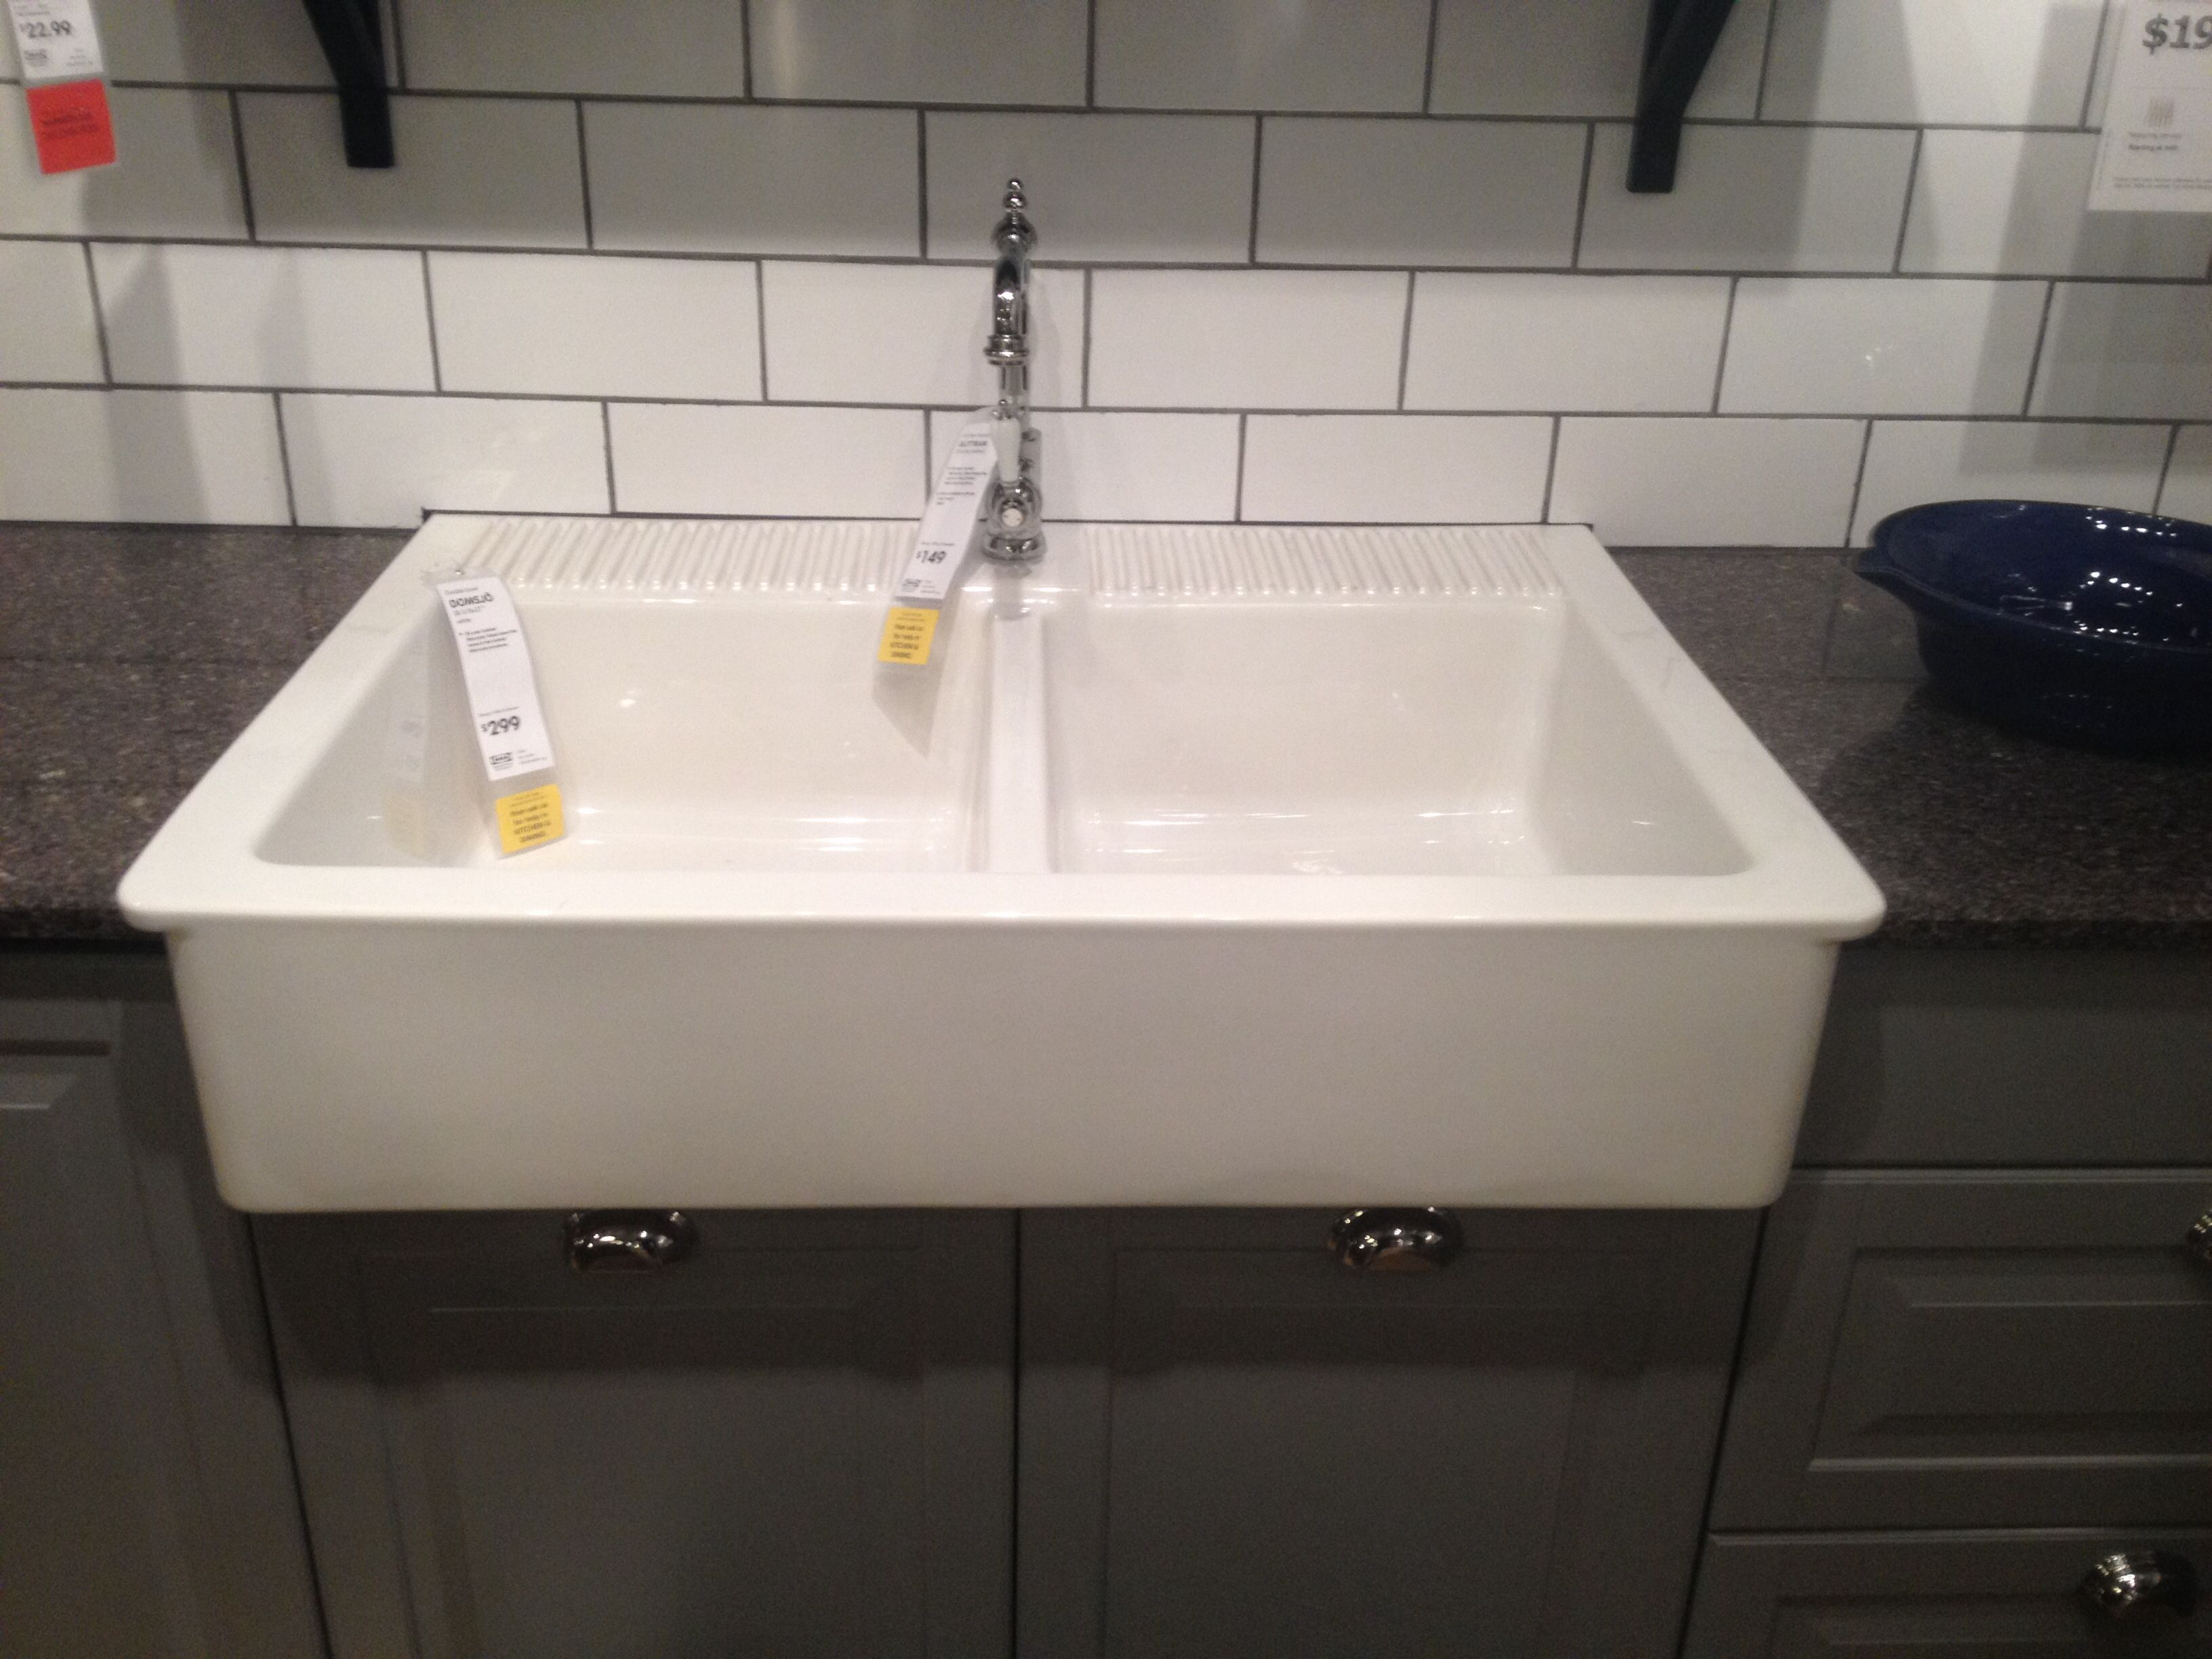 Farm kitchen sink from ikea Ikea kitchen sink, Ikea